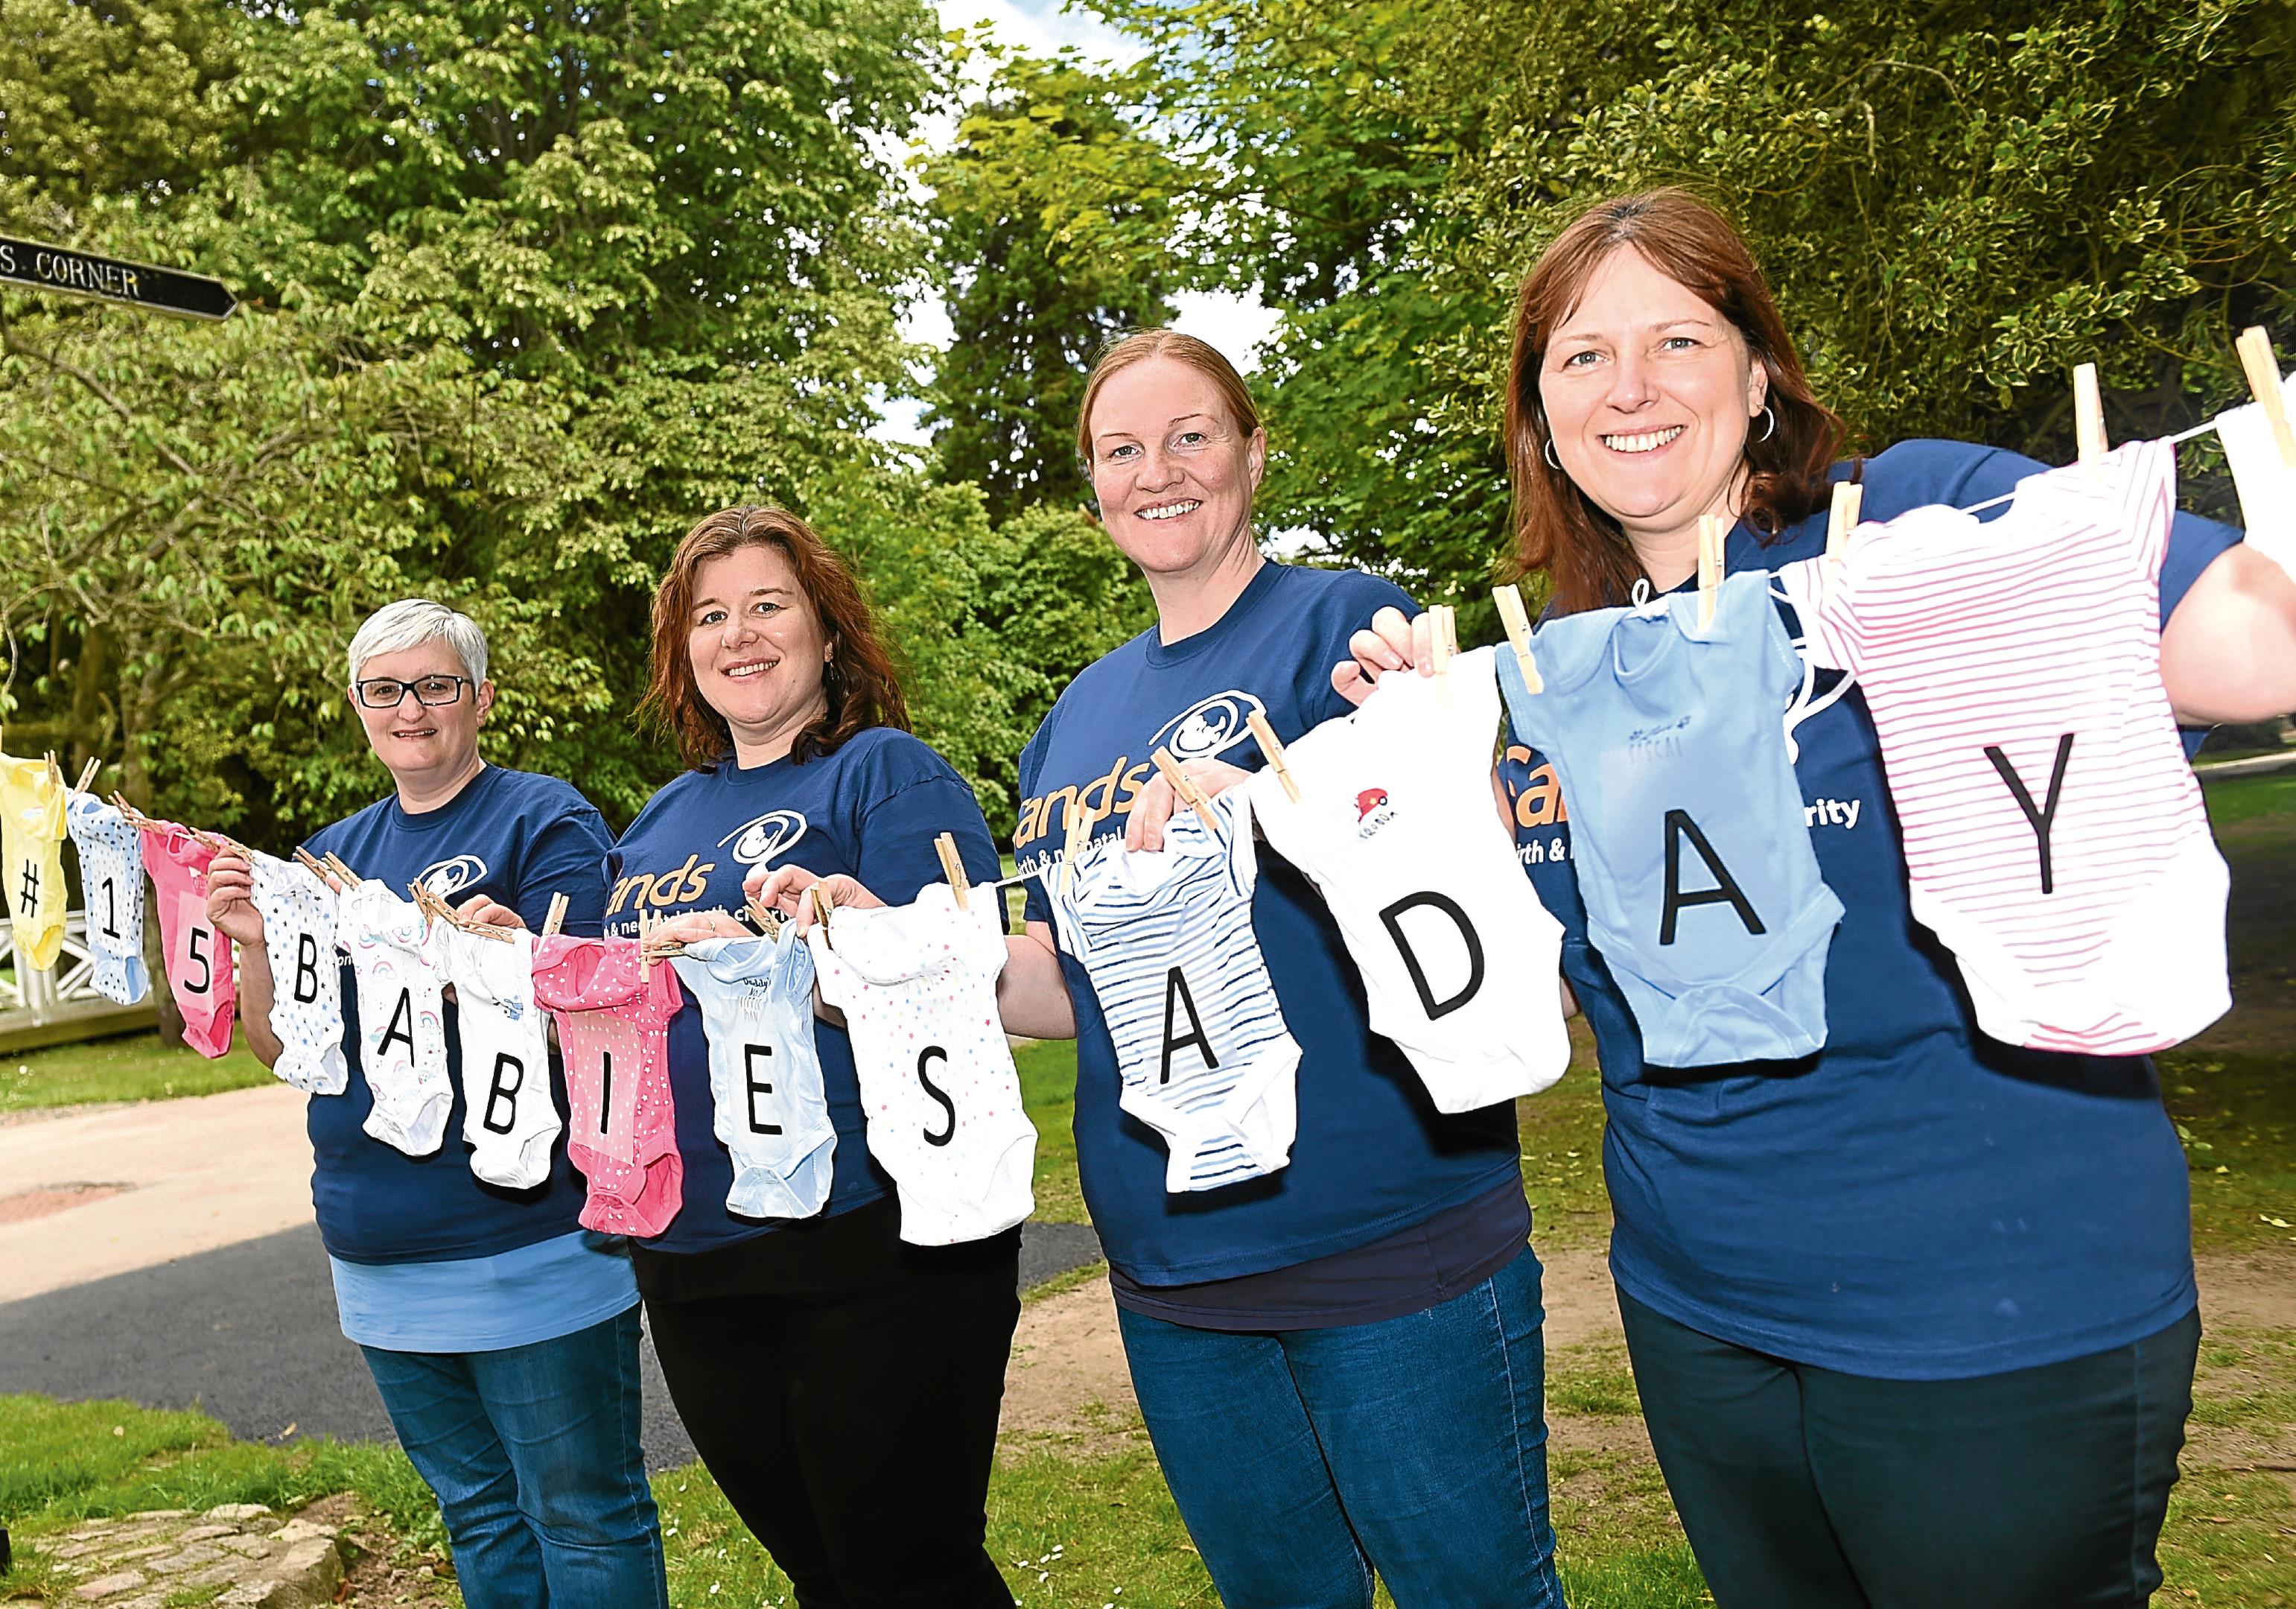 From left, Heather Robb, Jennifer Yeomans, Catherine Stewart and Sandra Stephen with the babygros at Hazlehead Park.